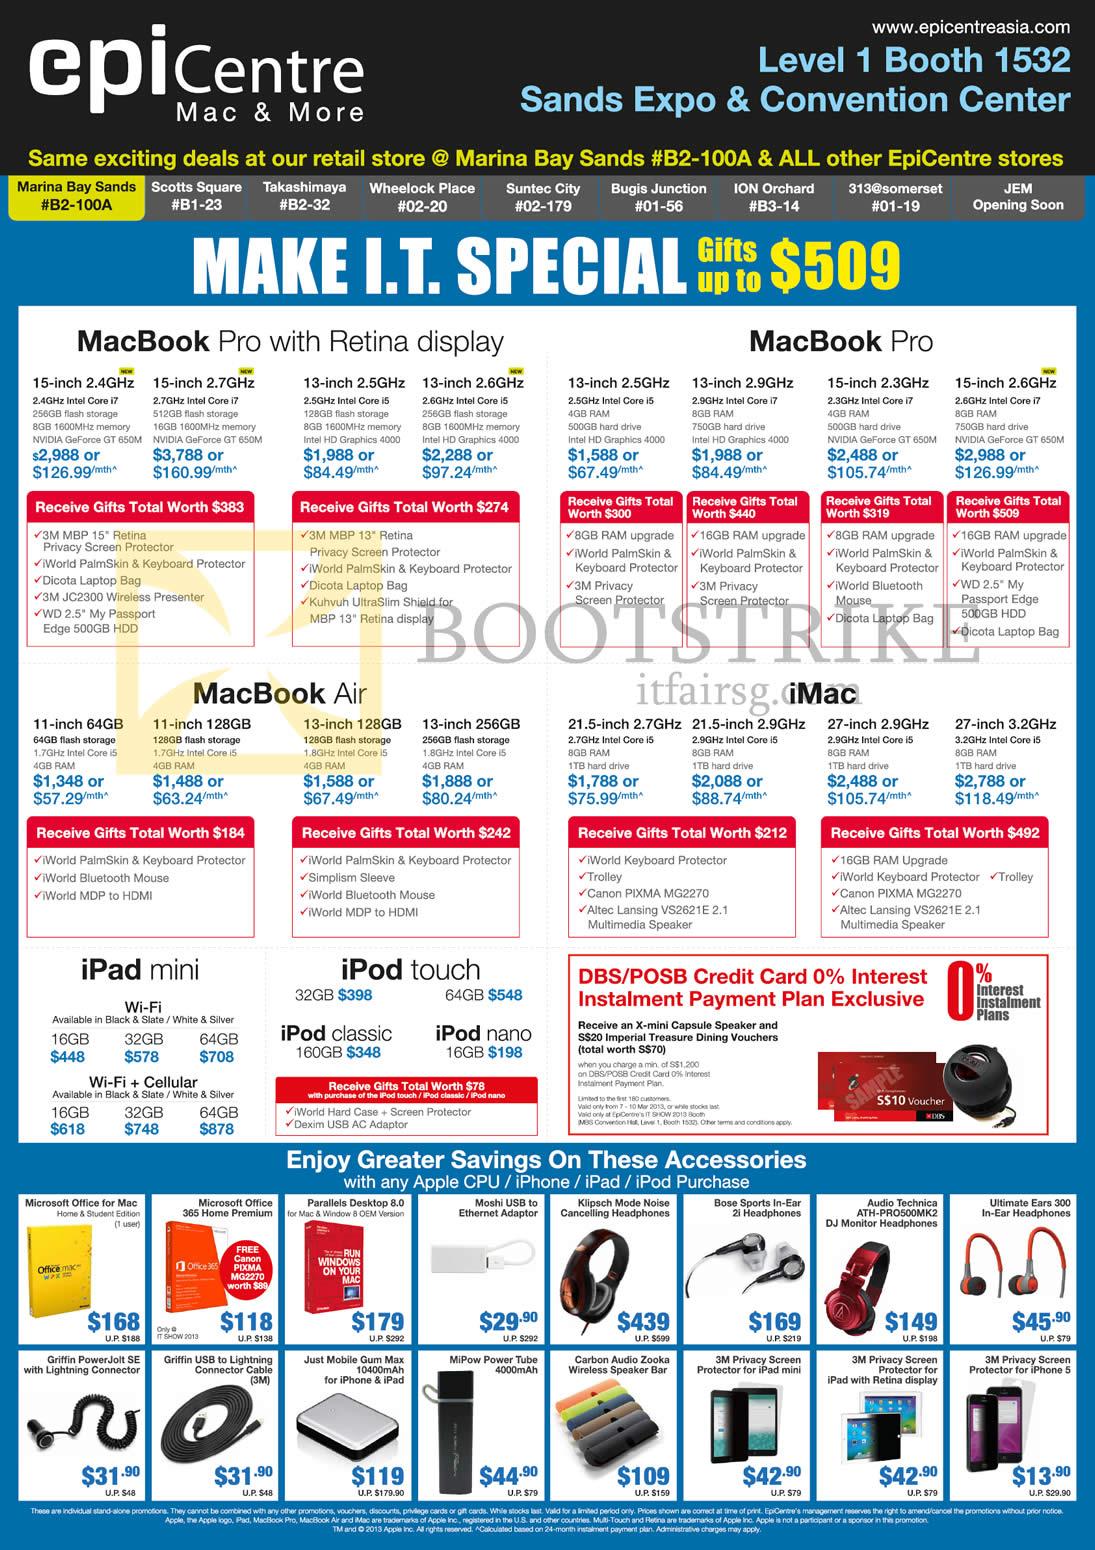 IT SHOW 2013 Price List Image Brochure Of EpiCentre Apple MacBook Pro Air IMac